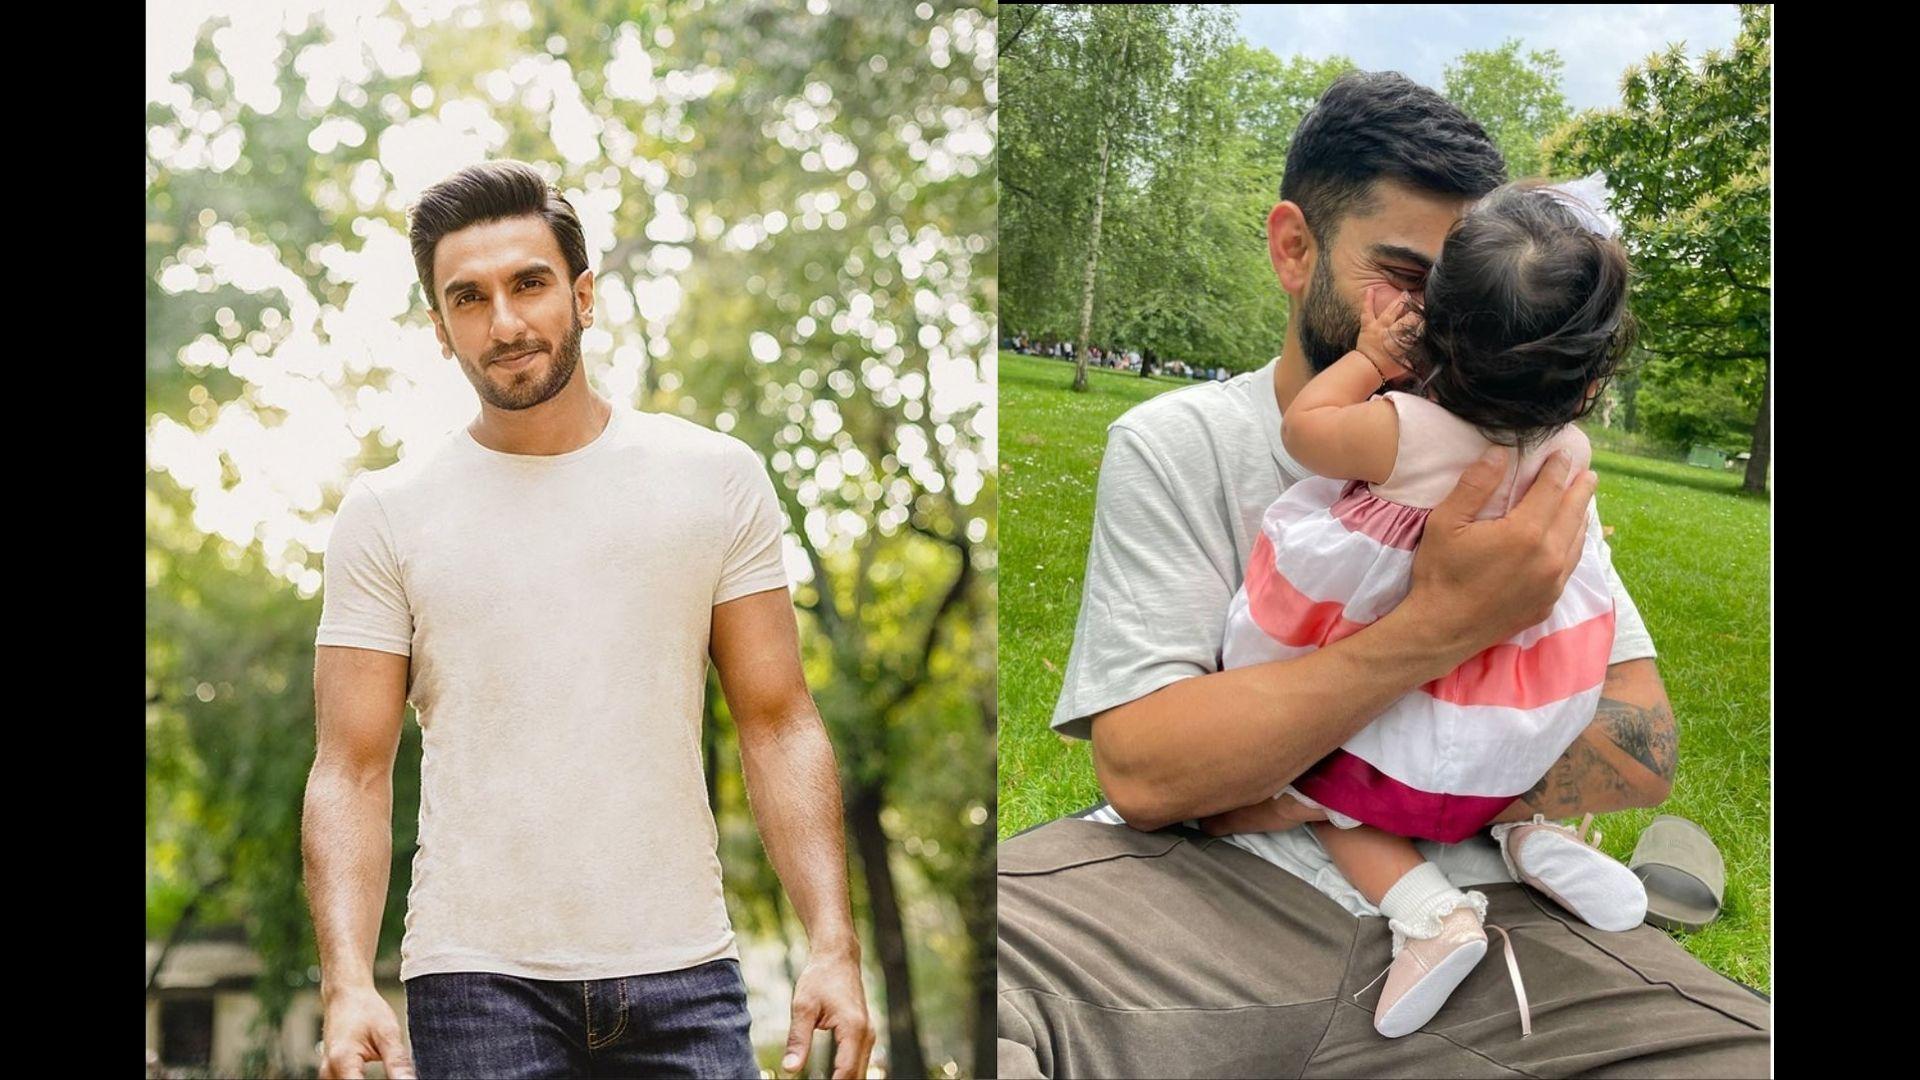 Ranveer Singh's Comment On Anushka Sharma's Instagram Post Ft Virat Kohli And Daughter Vamika Makes Us Ponder If He Is Ready To Embrace Parenthood